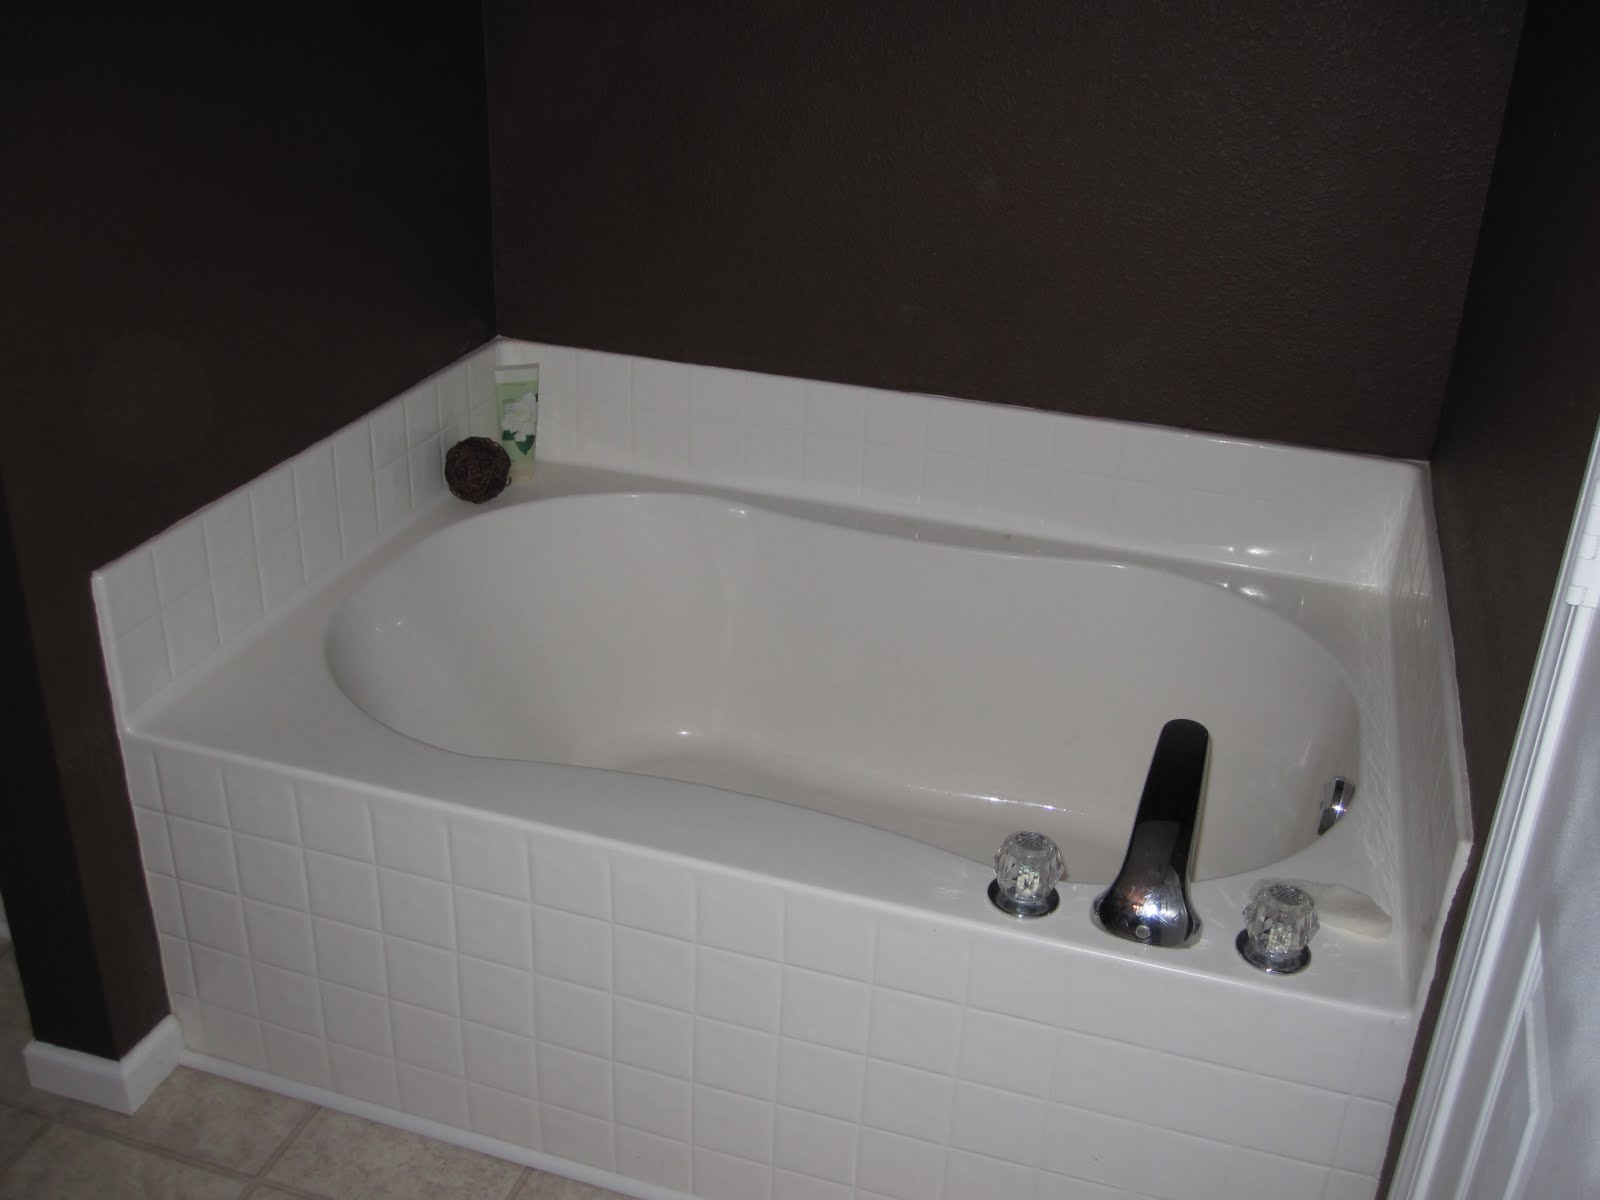 Garden Design With Thrifty Like Me Master Bathroom Garden Tub With Outdoor Landscape Ideas